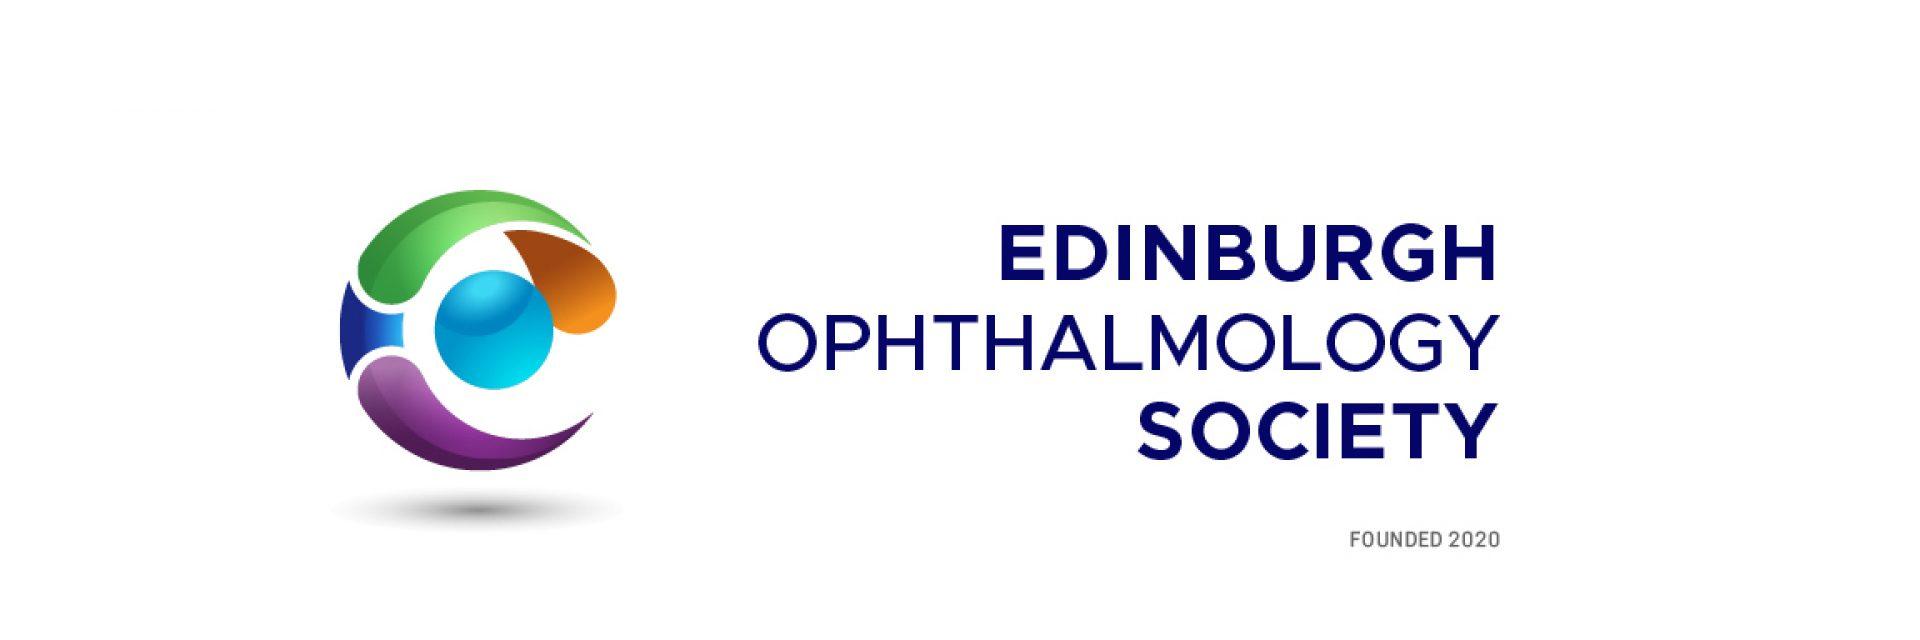 Edinburgh Ophthalmology Society